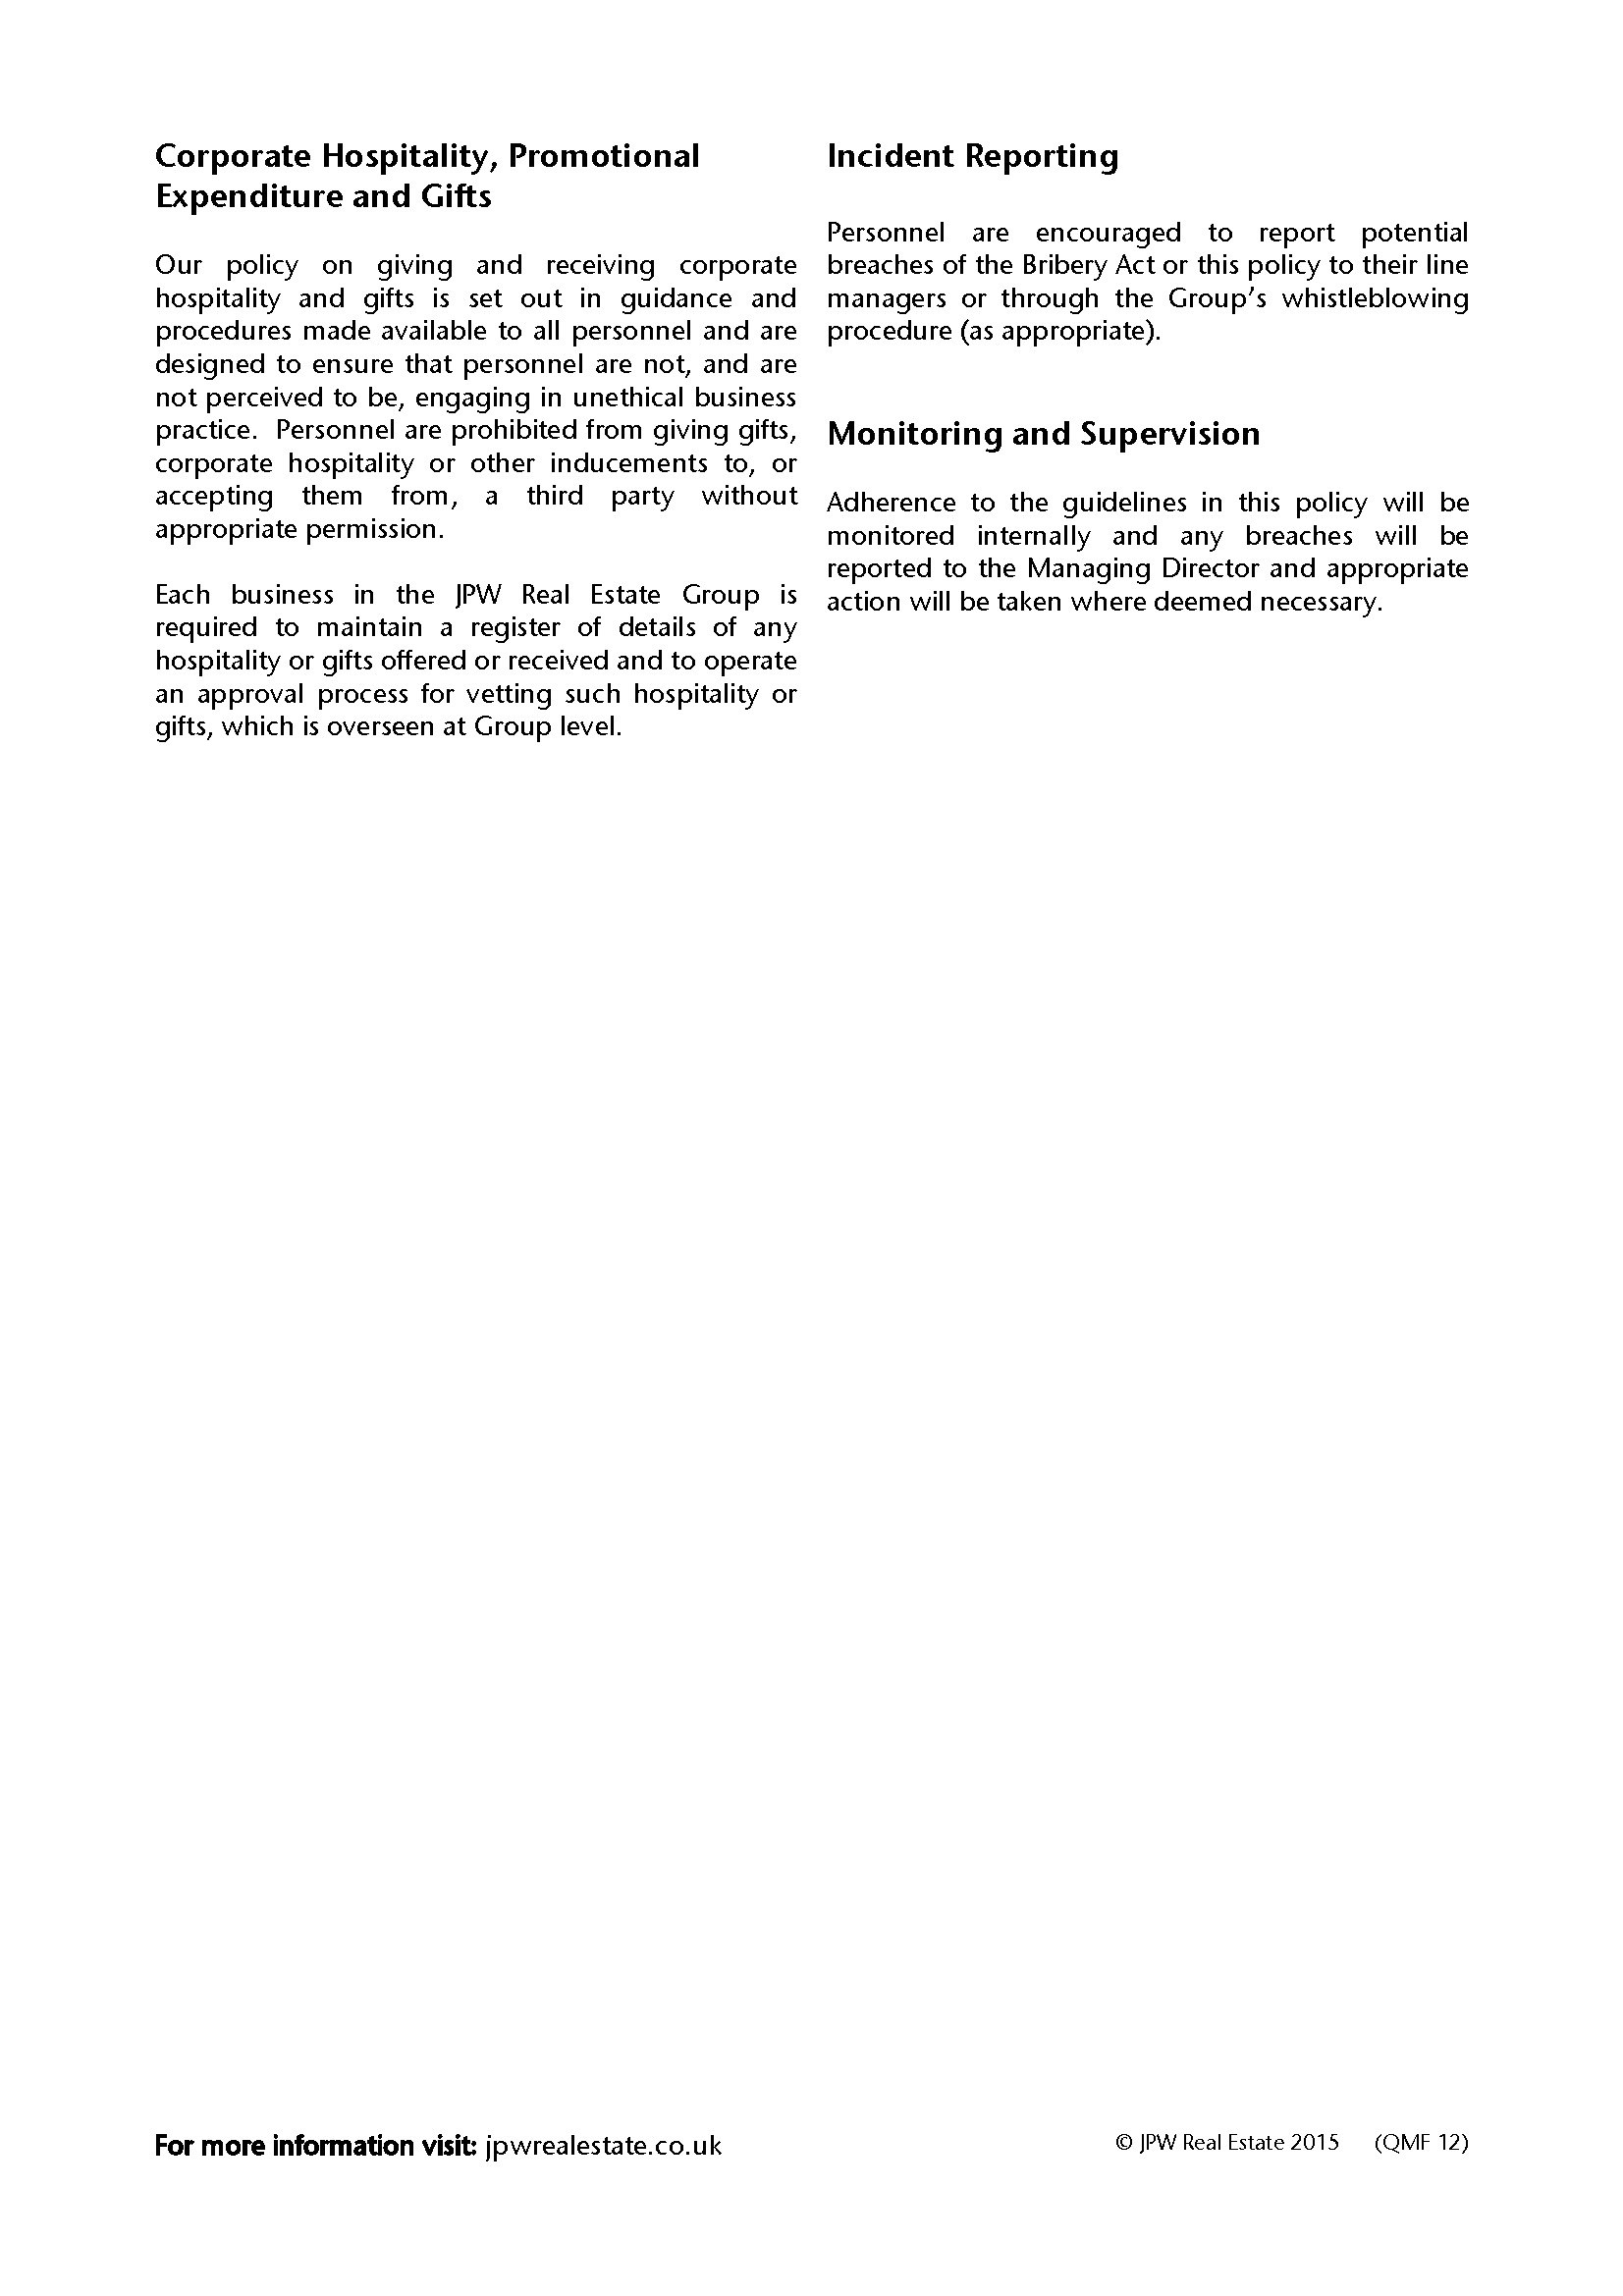 Jpw Anti Bribery Policy 2015 Page 2